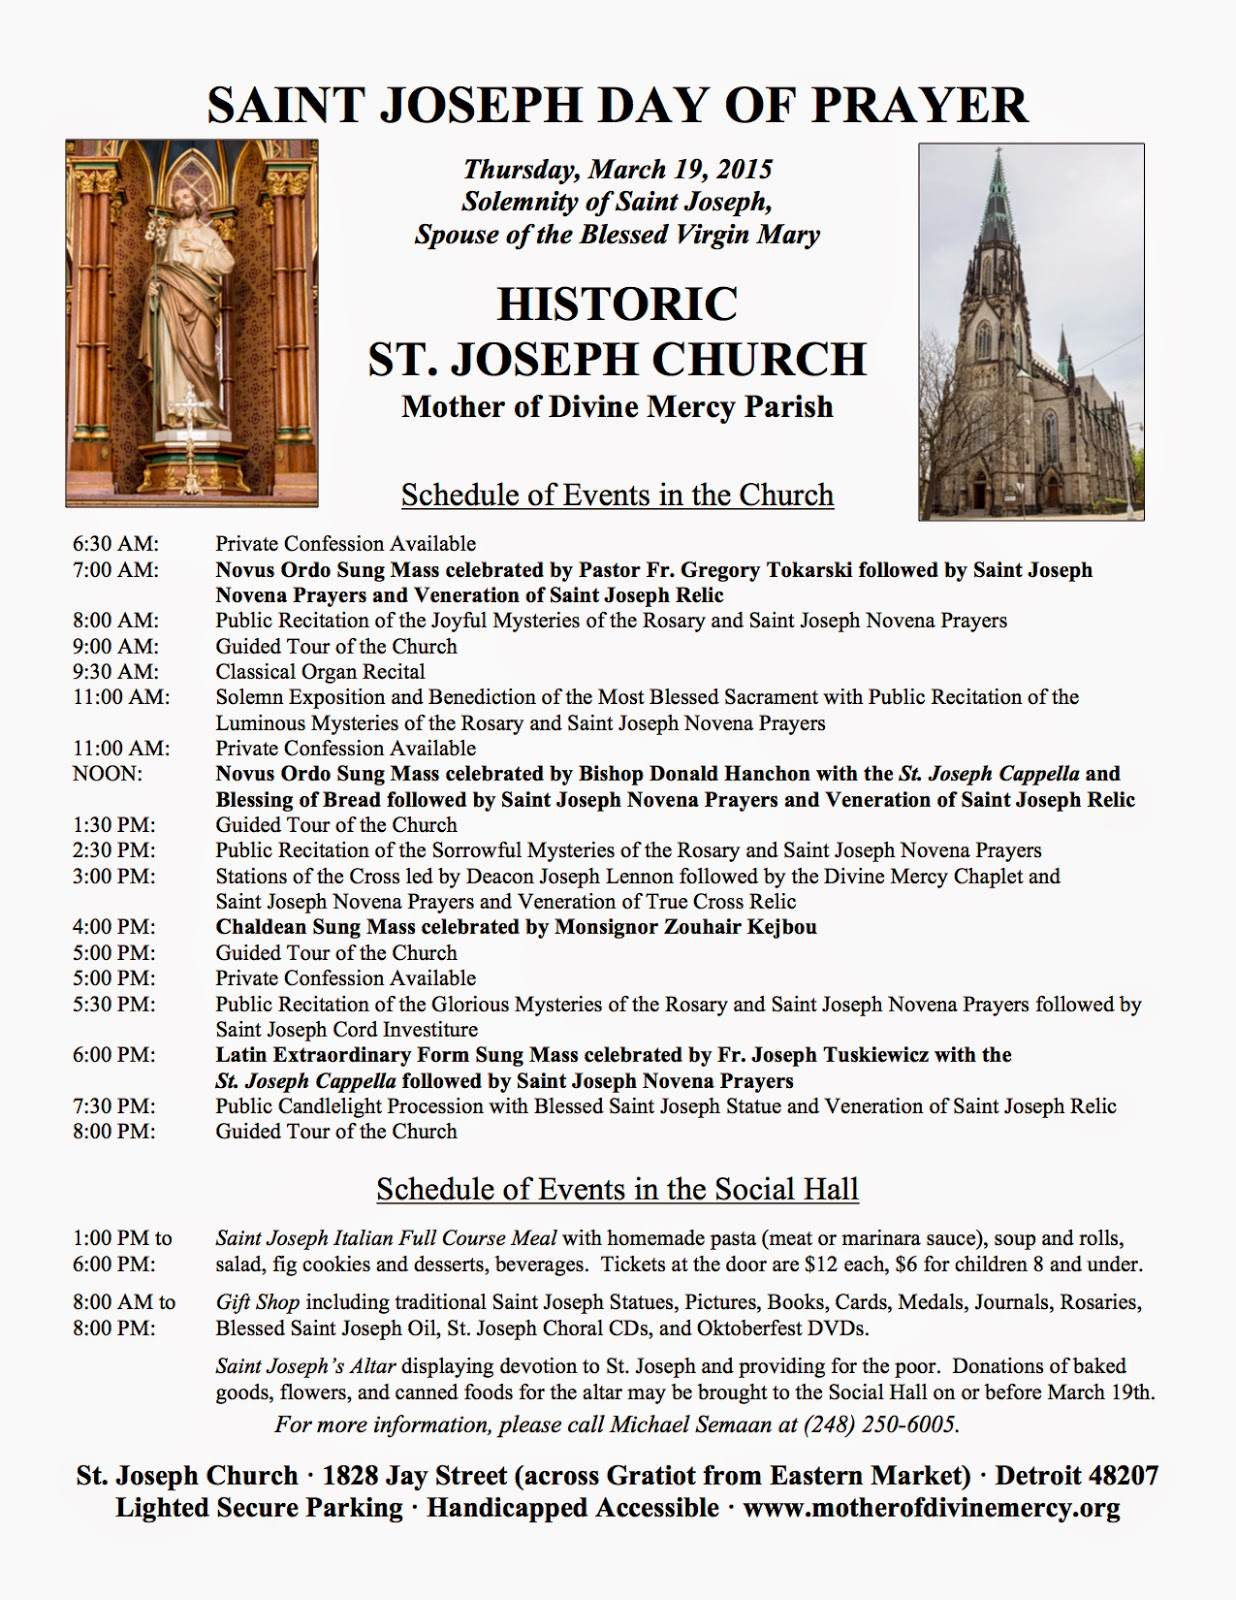 new liturgical movement st joseph day of prayer in detroit rh newliturgicalmovement org